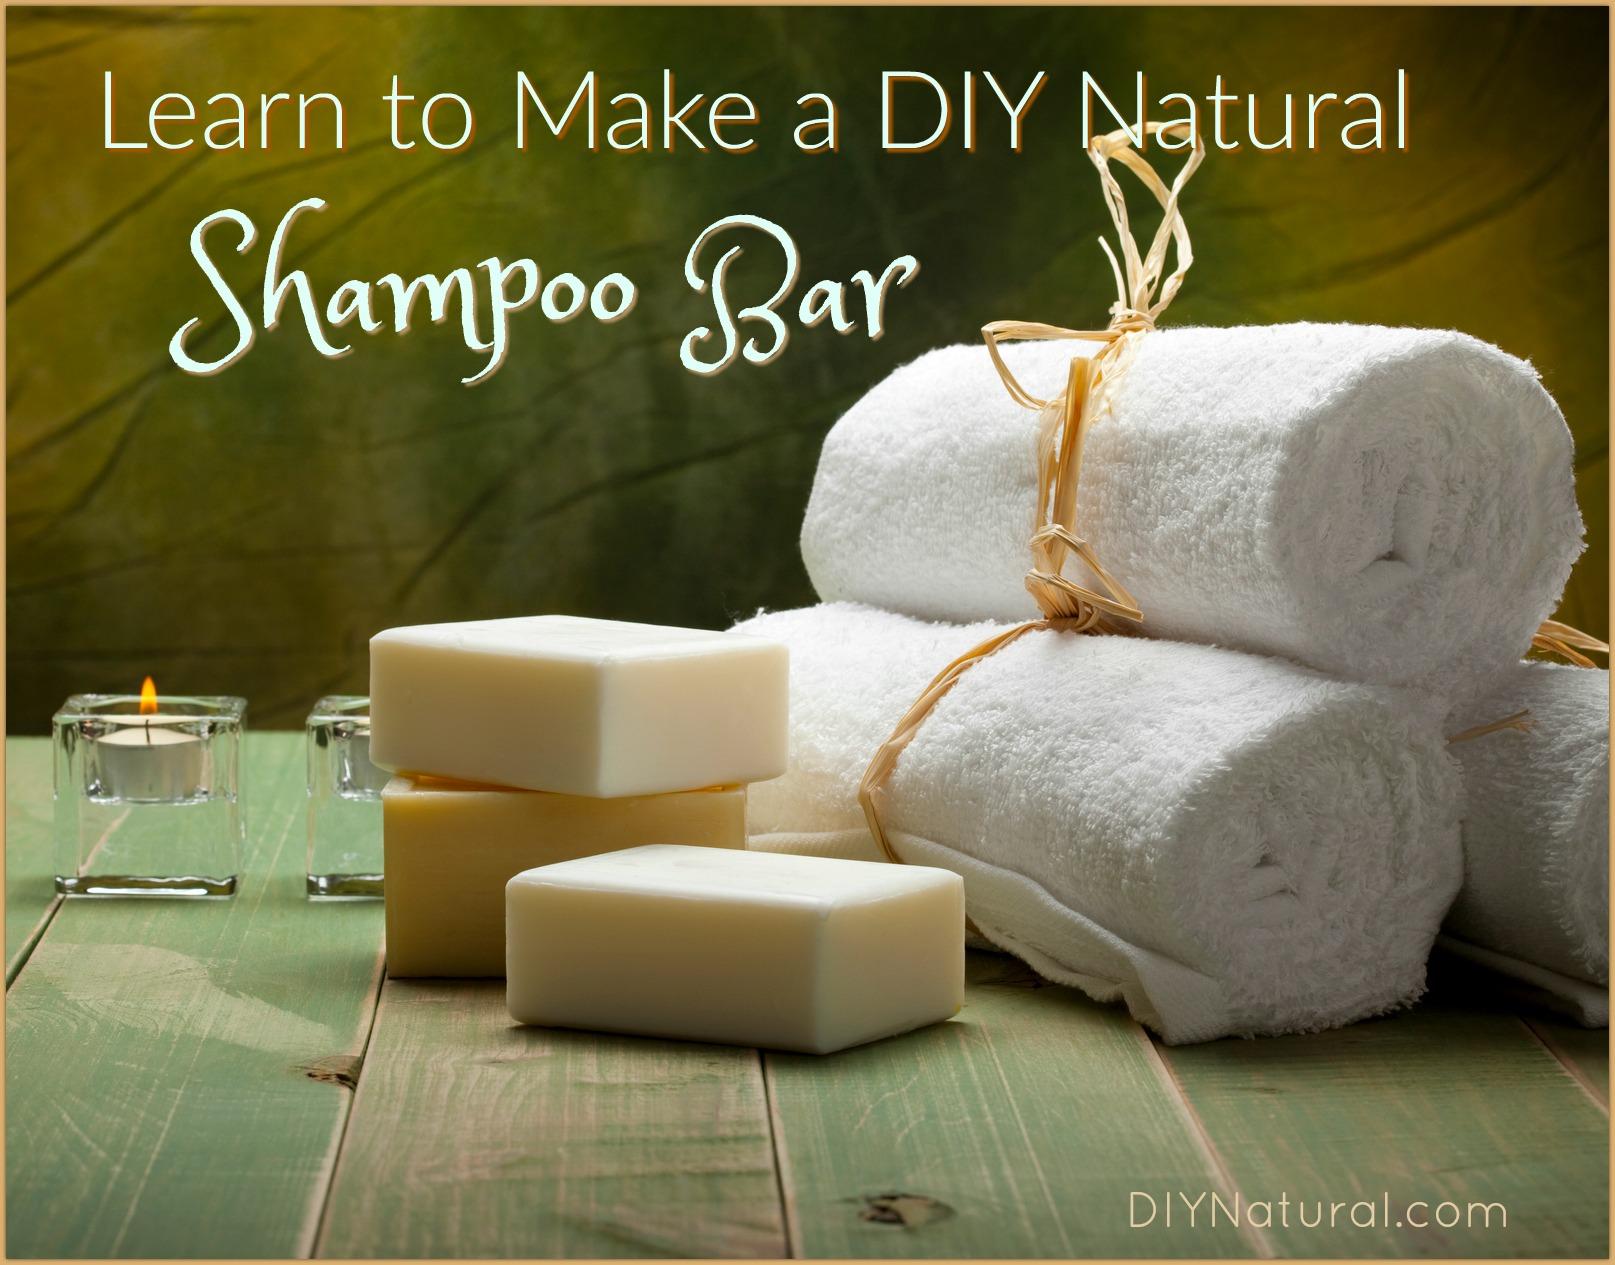 Homemade Shampoo Bar Make Natural Diy Shampoo Bars